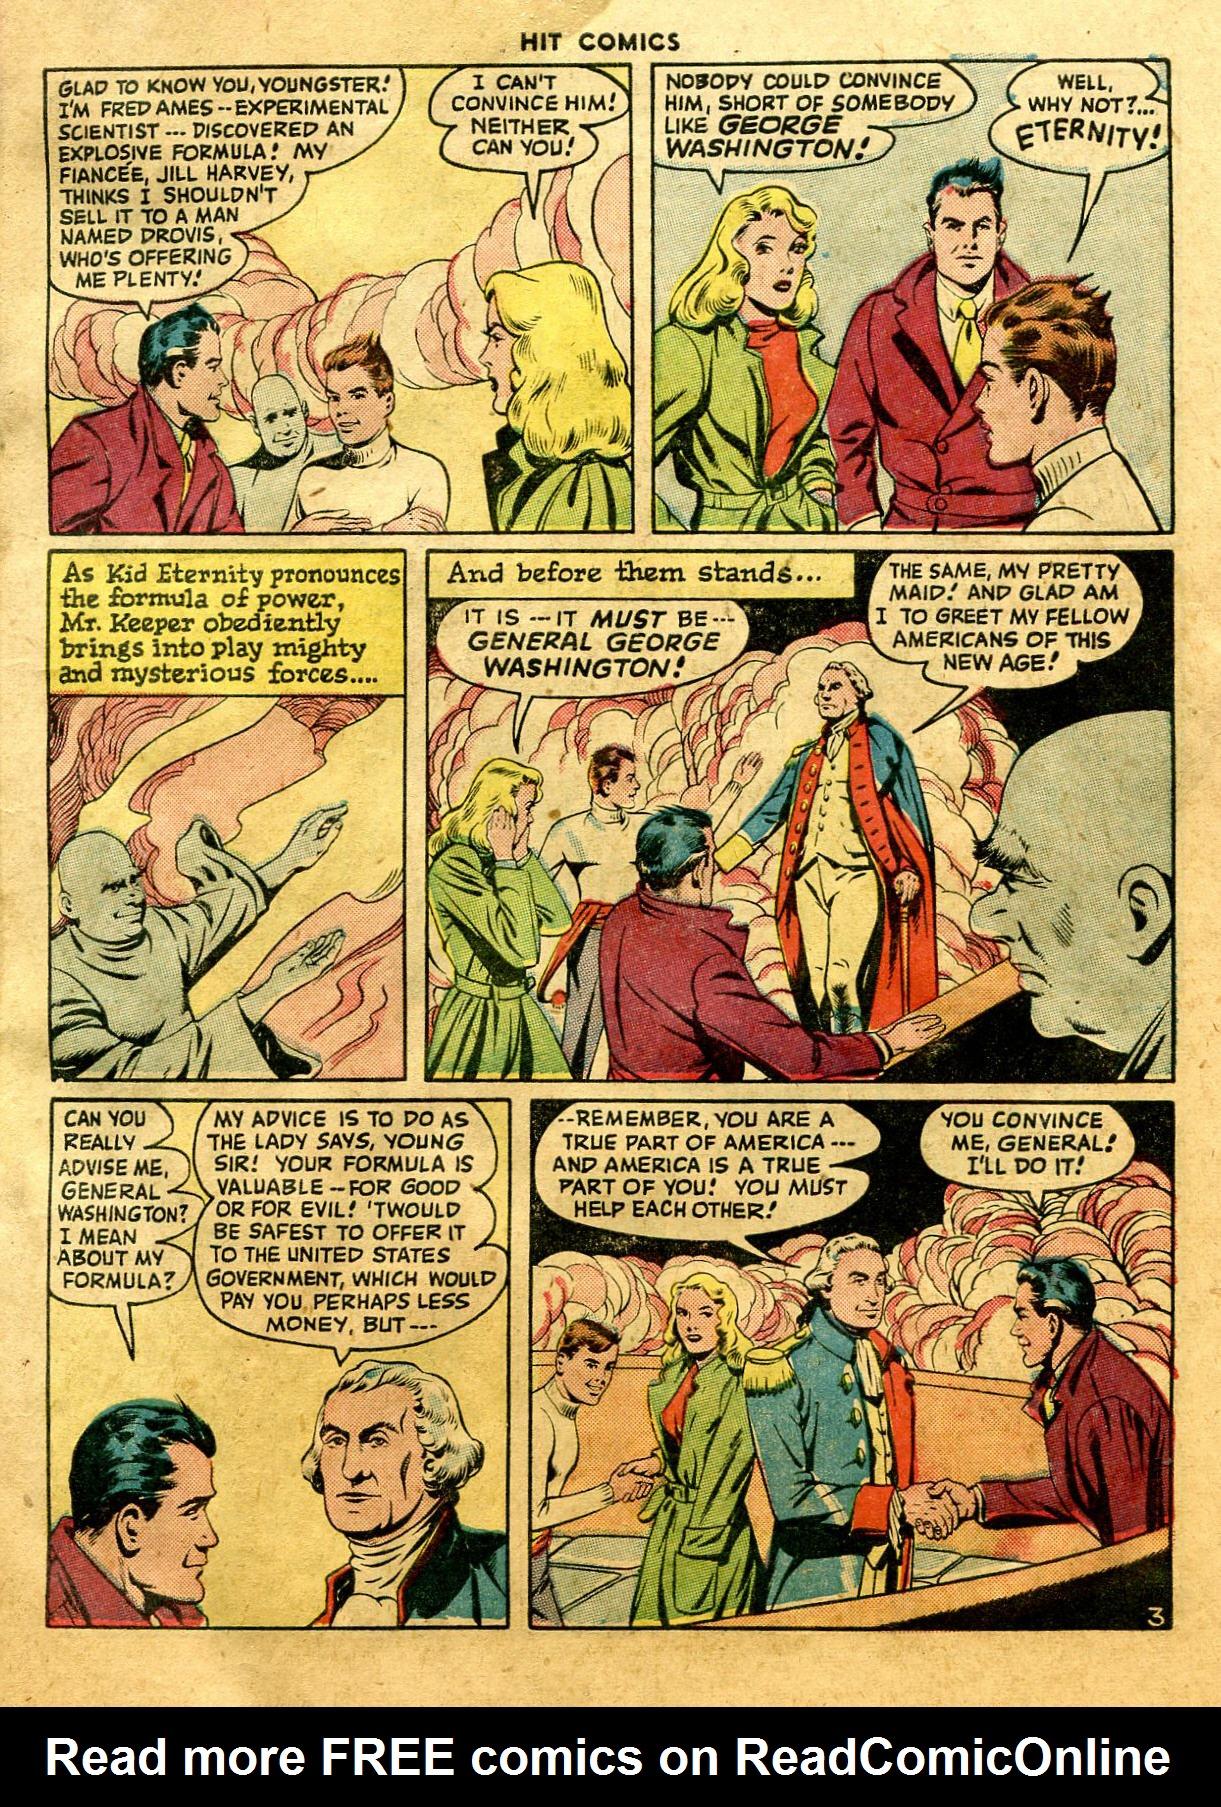 Read online Hit Comics comic -  Issue #44 - 5